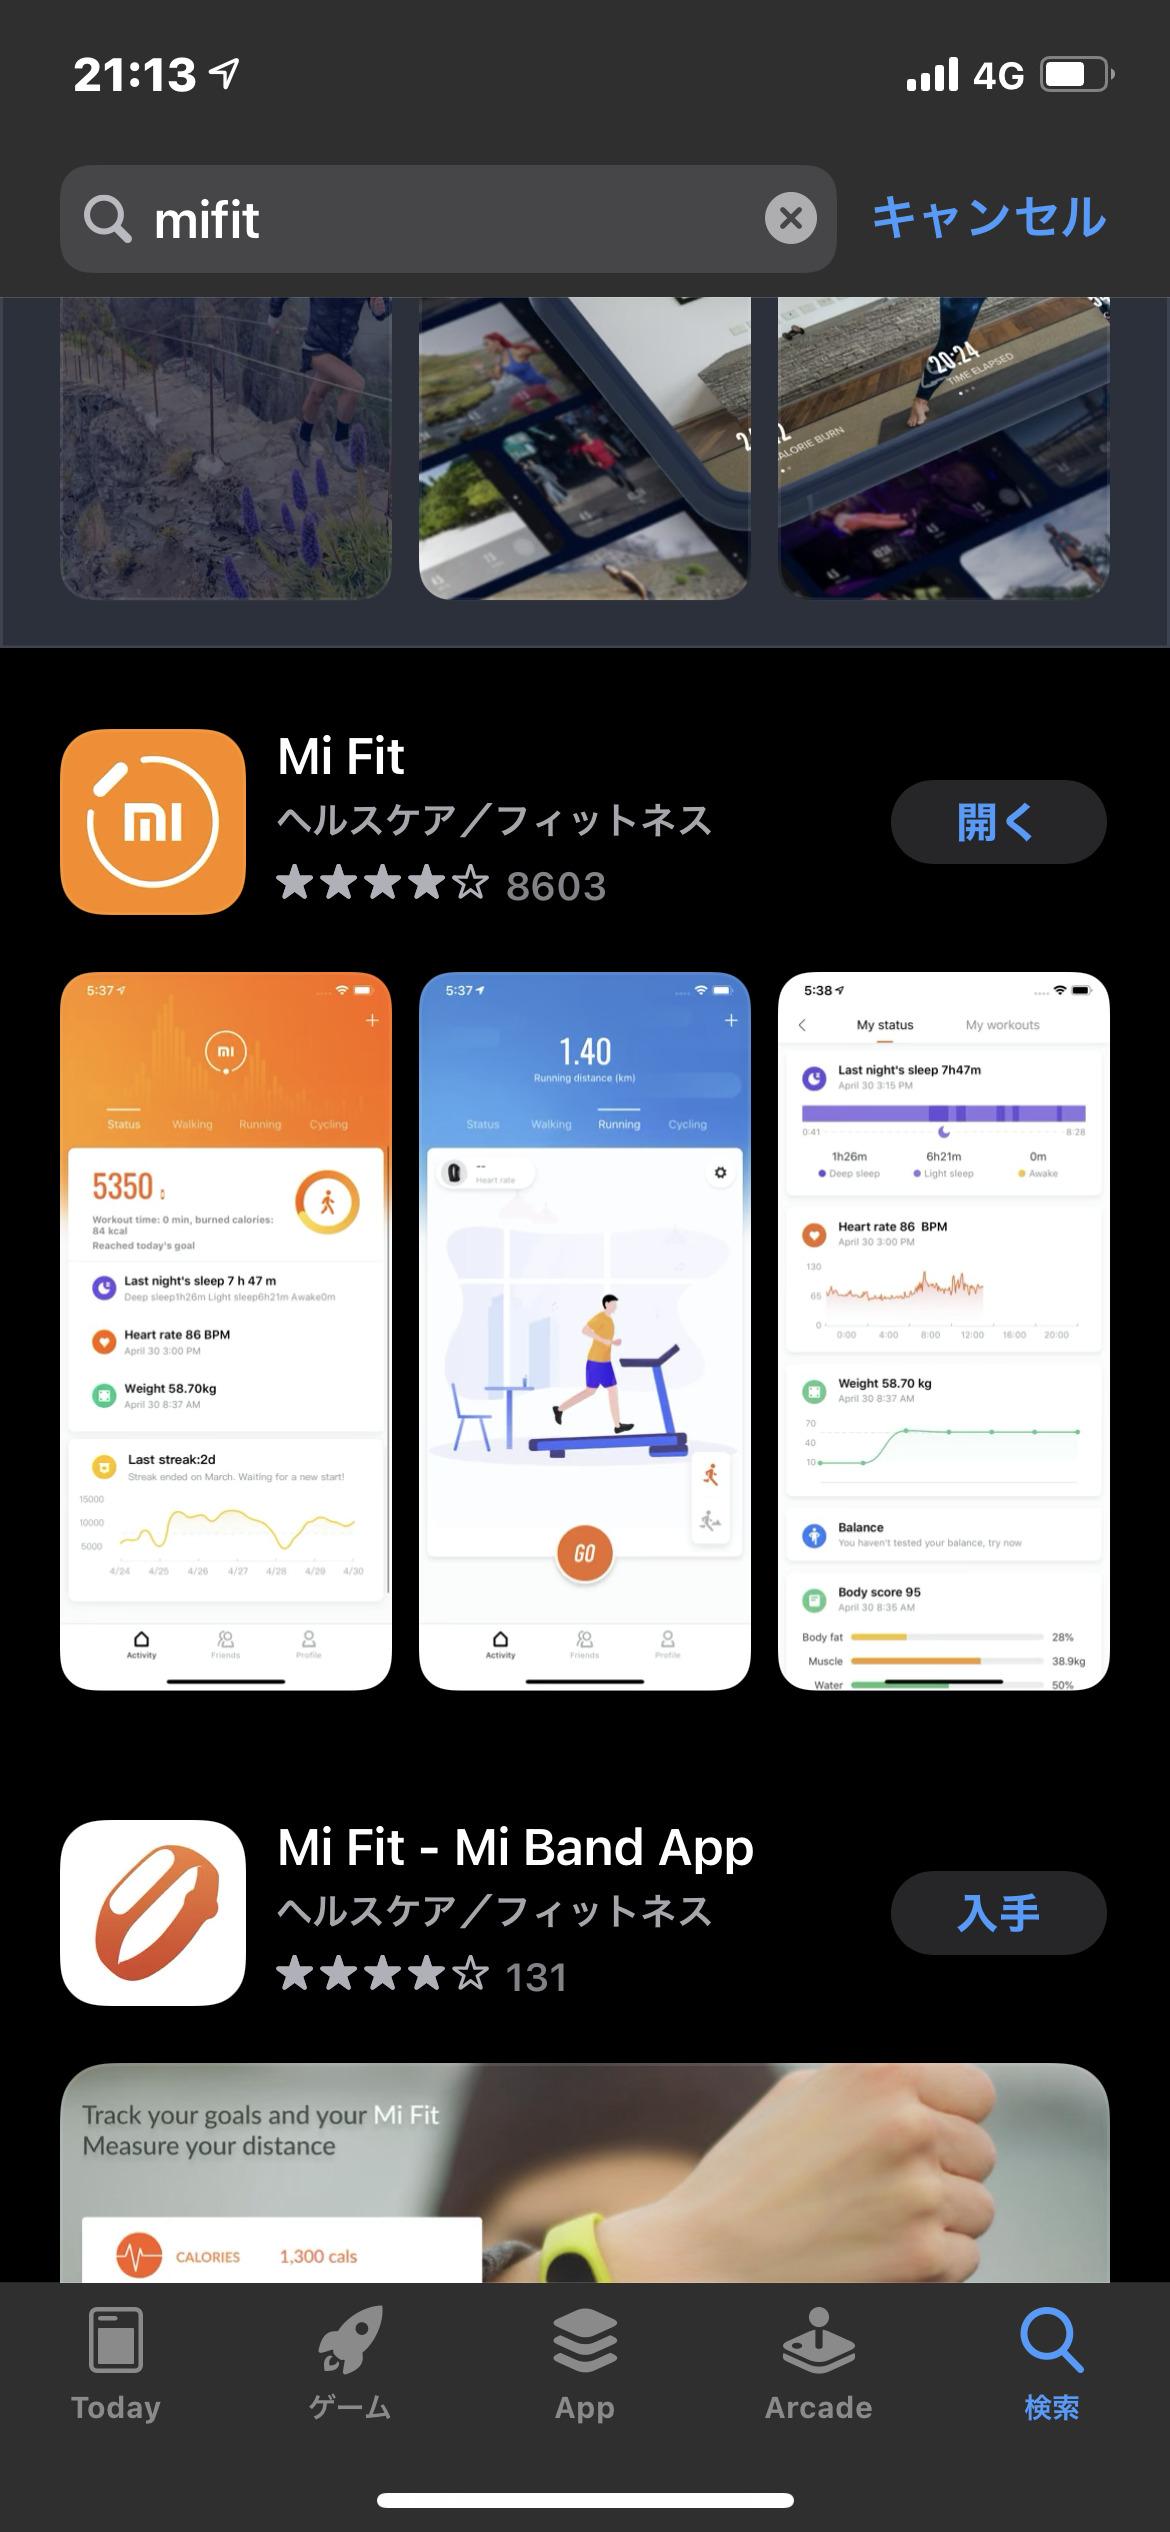 iosのMi Fitアプリ